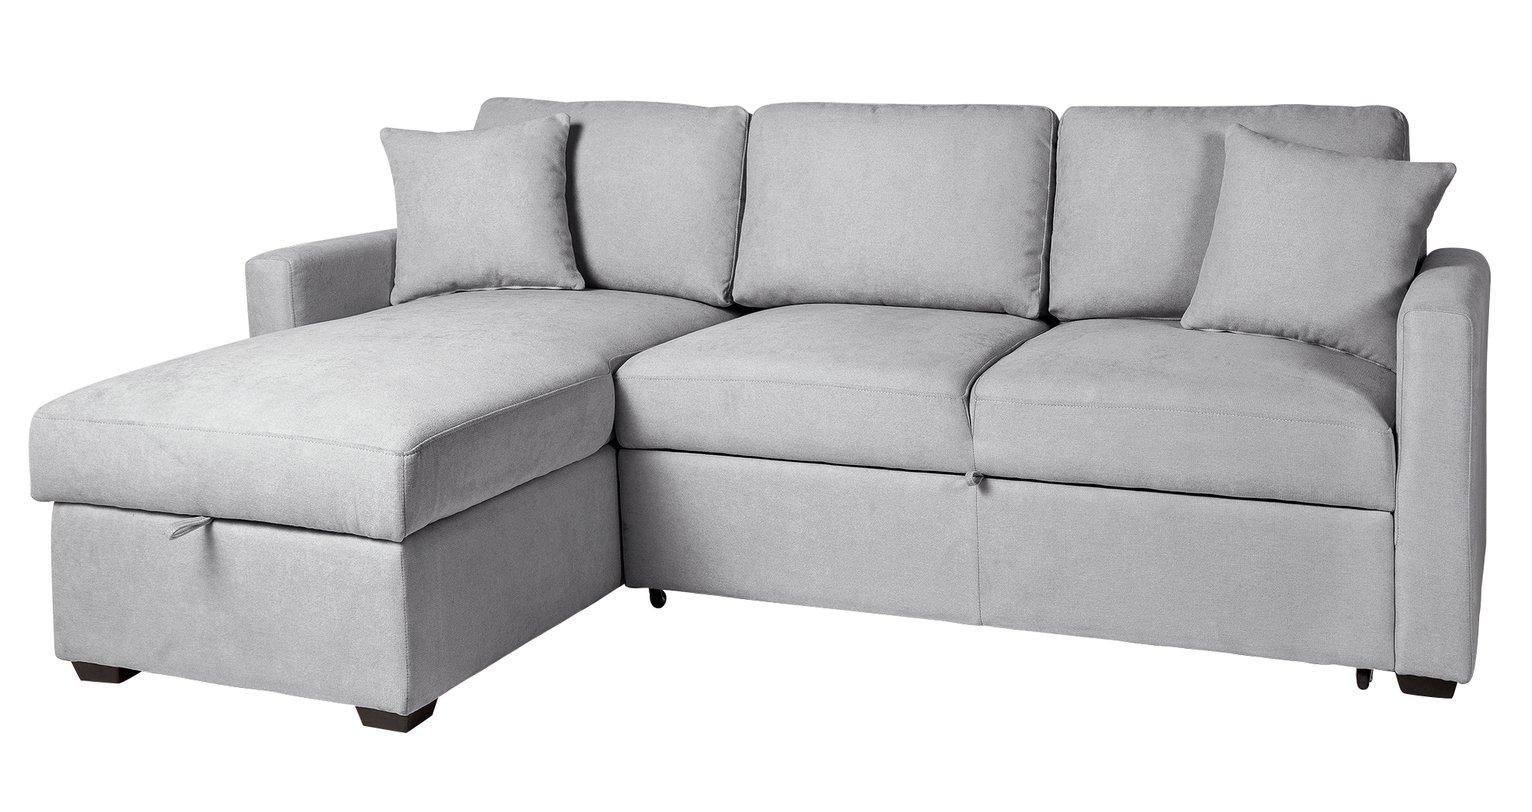 Argos Home Reagan Left Corner Fabric Storage Sofa Bed - Grey